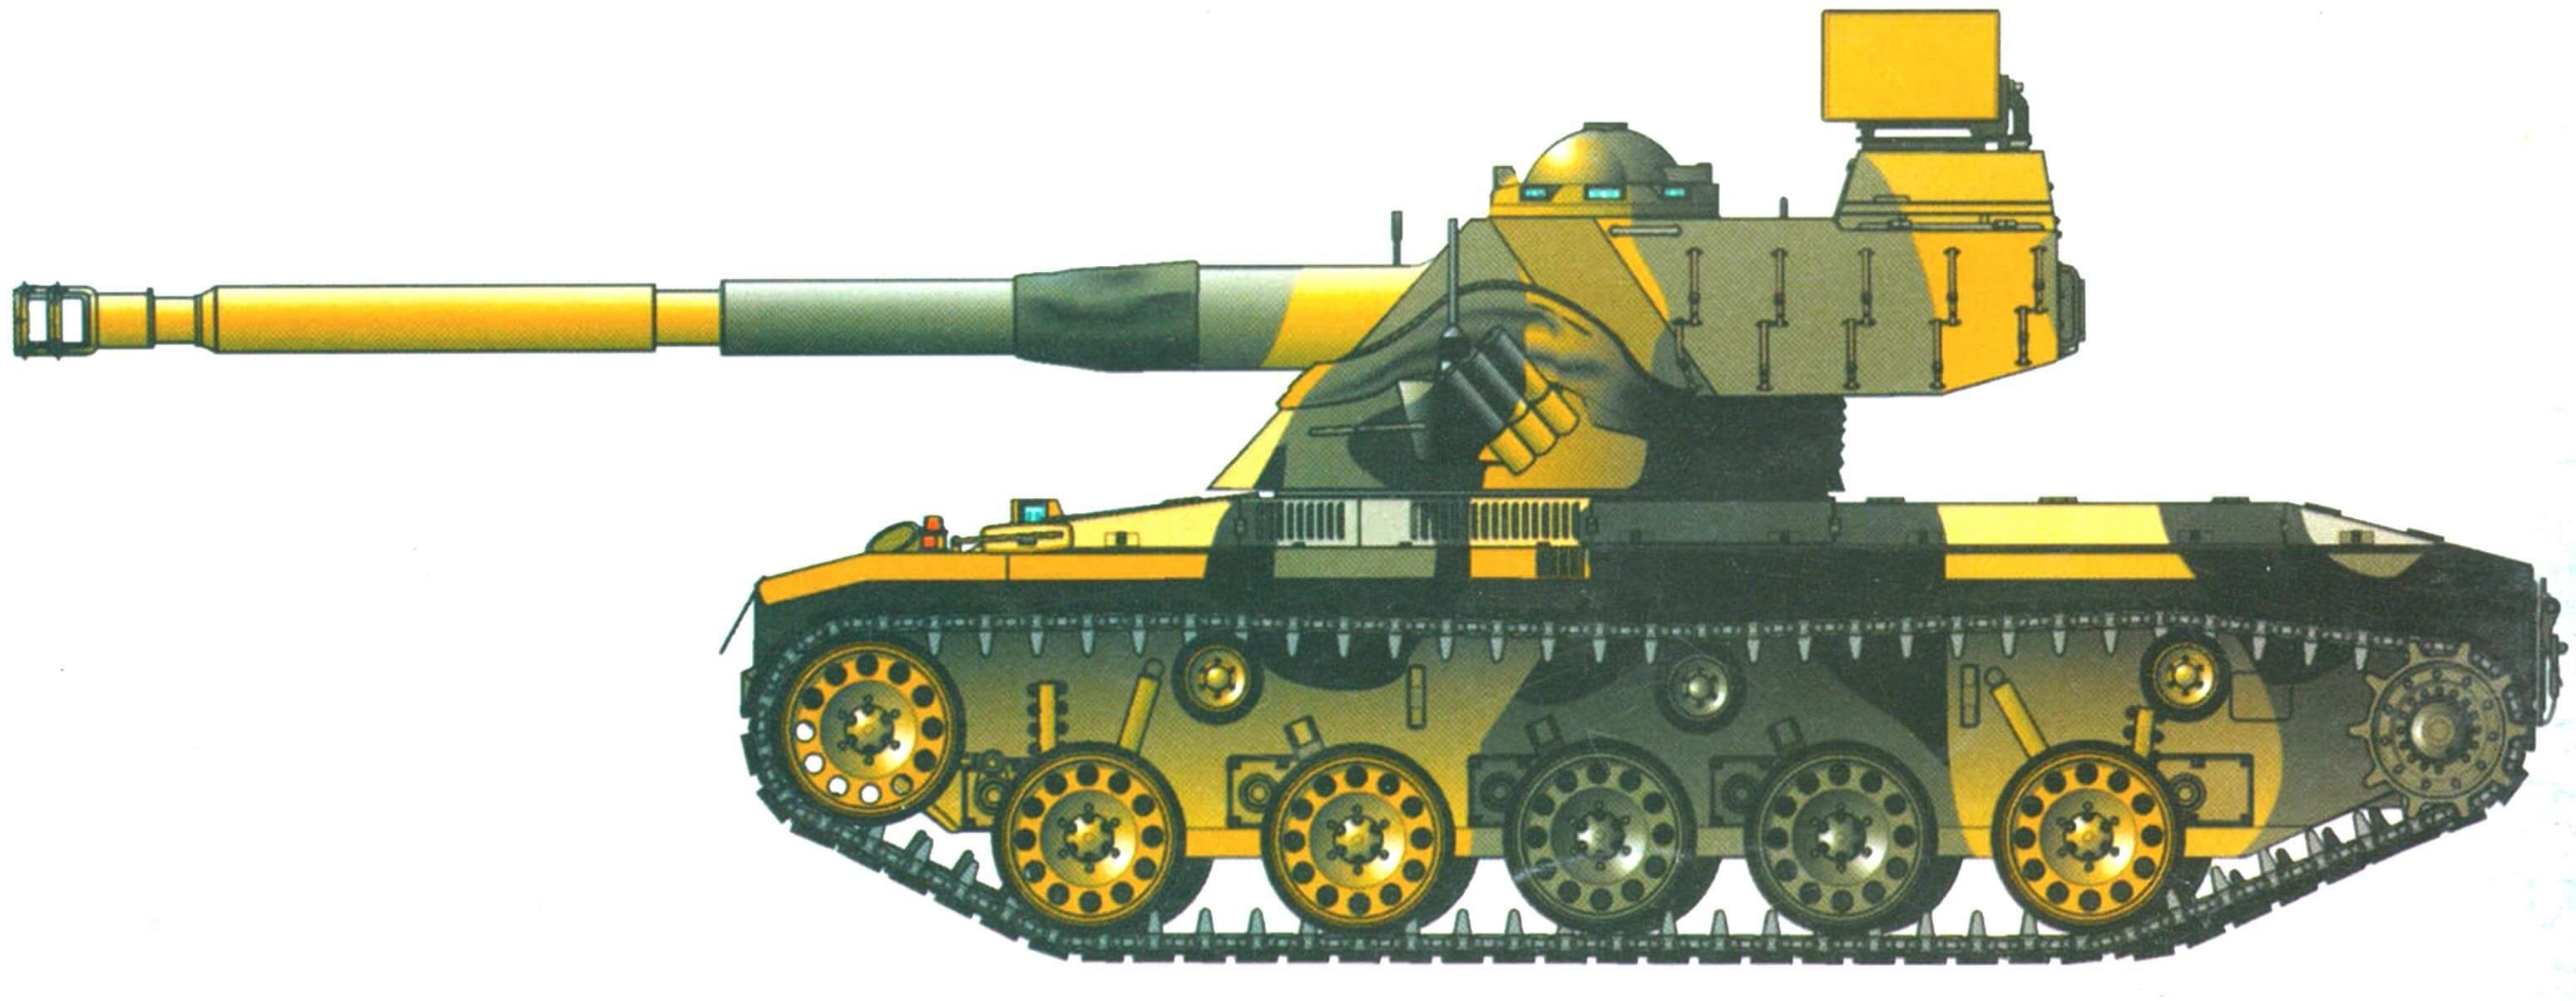 "SK-105 ""Кирасир"" аргентинской армии"